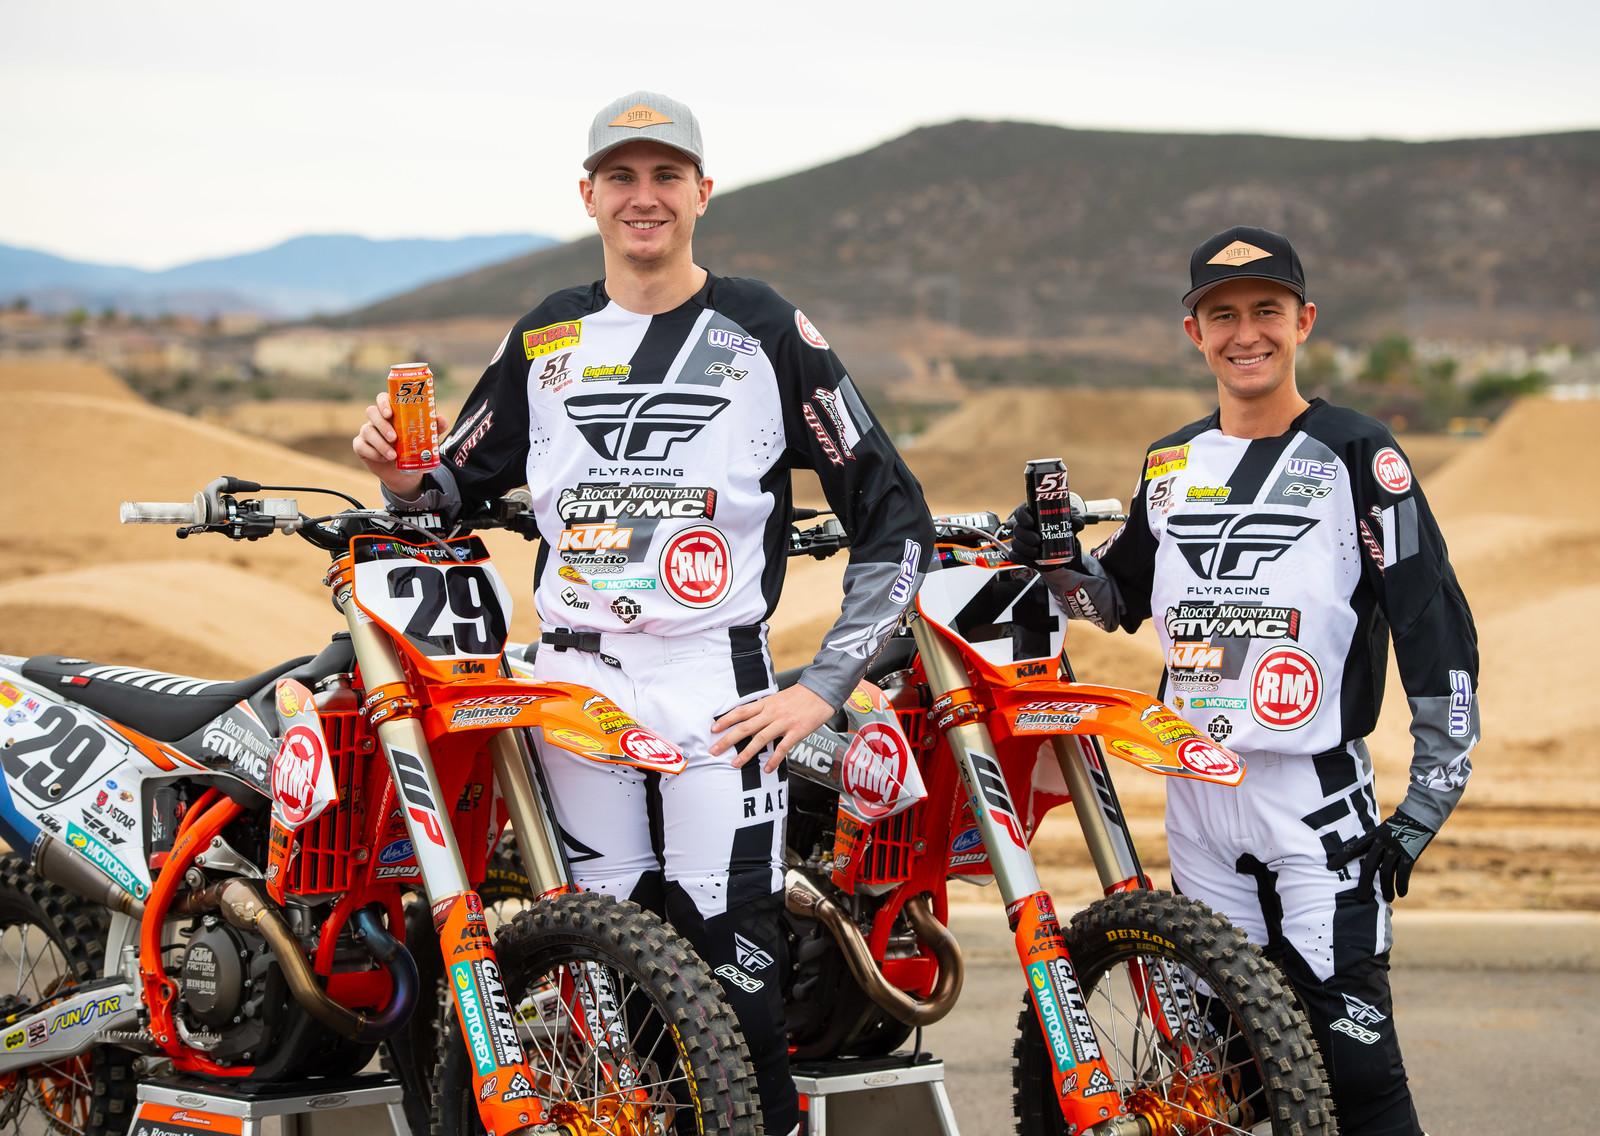 2019 Team Rocky Mountain ATV/MC - KTM - WPS